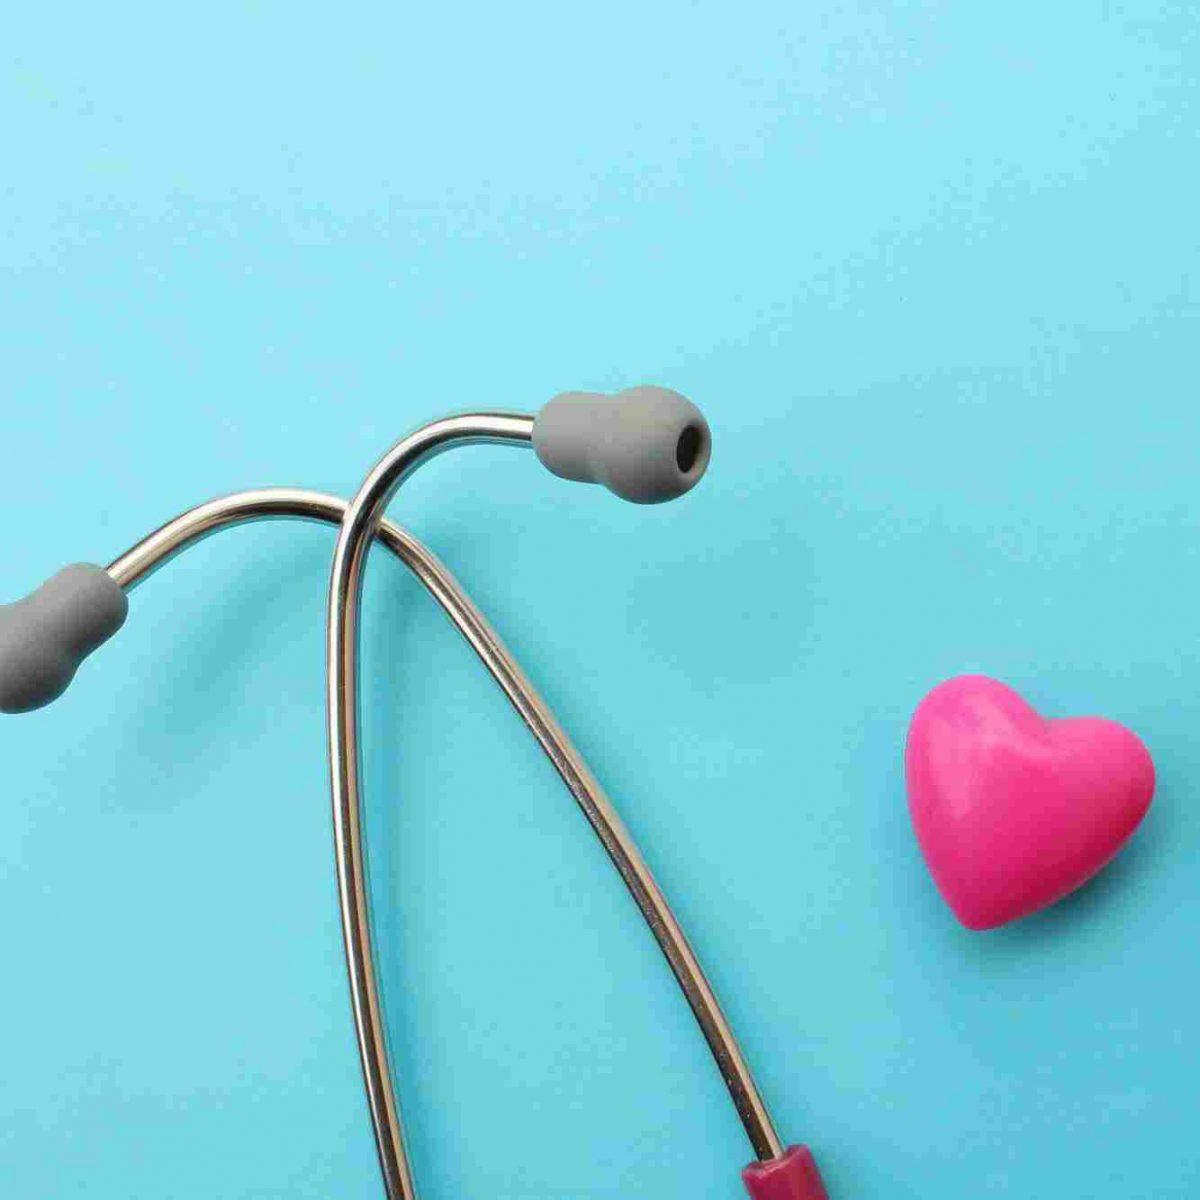 http://kinderarztpraxis-fulda.de/wp-content/uploads/2015/12/srce-i-stetoskop-1200x1200.jpg